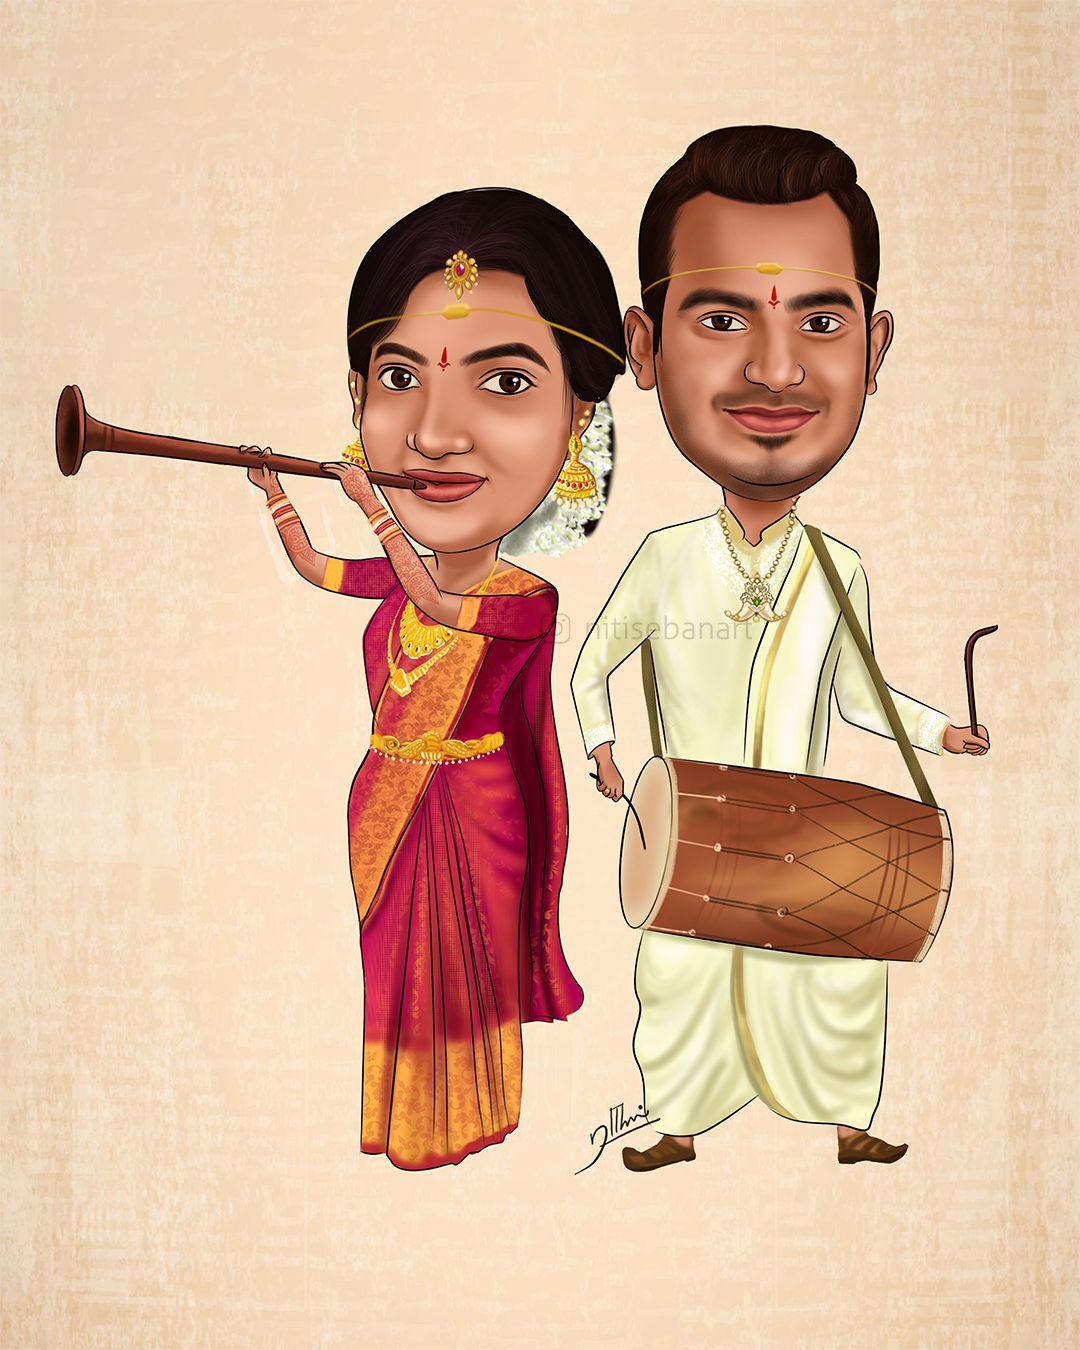 Hindu Wedding caricature, Custom Caricatures illustration